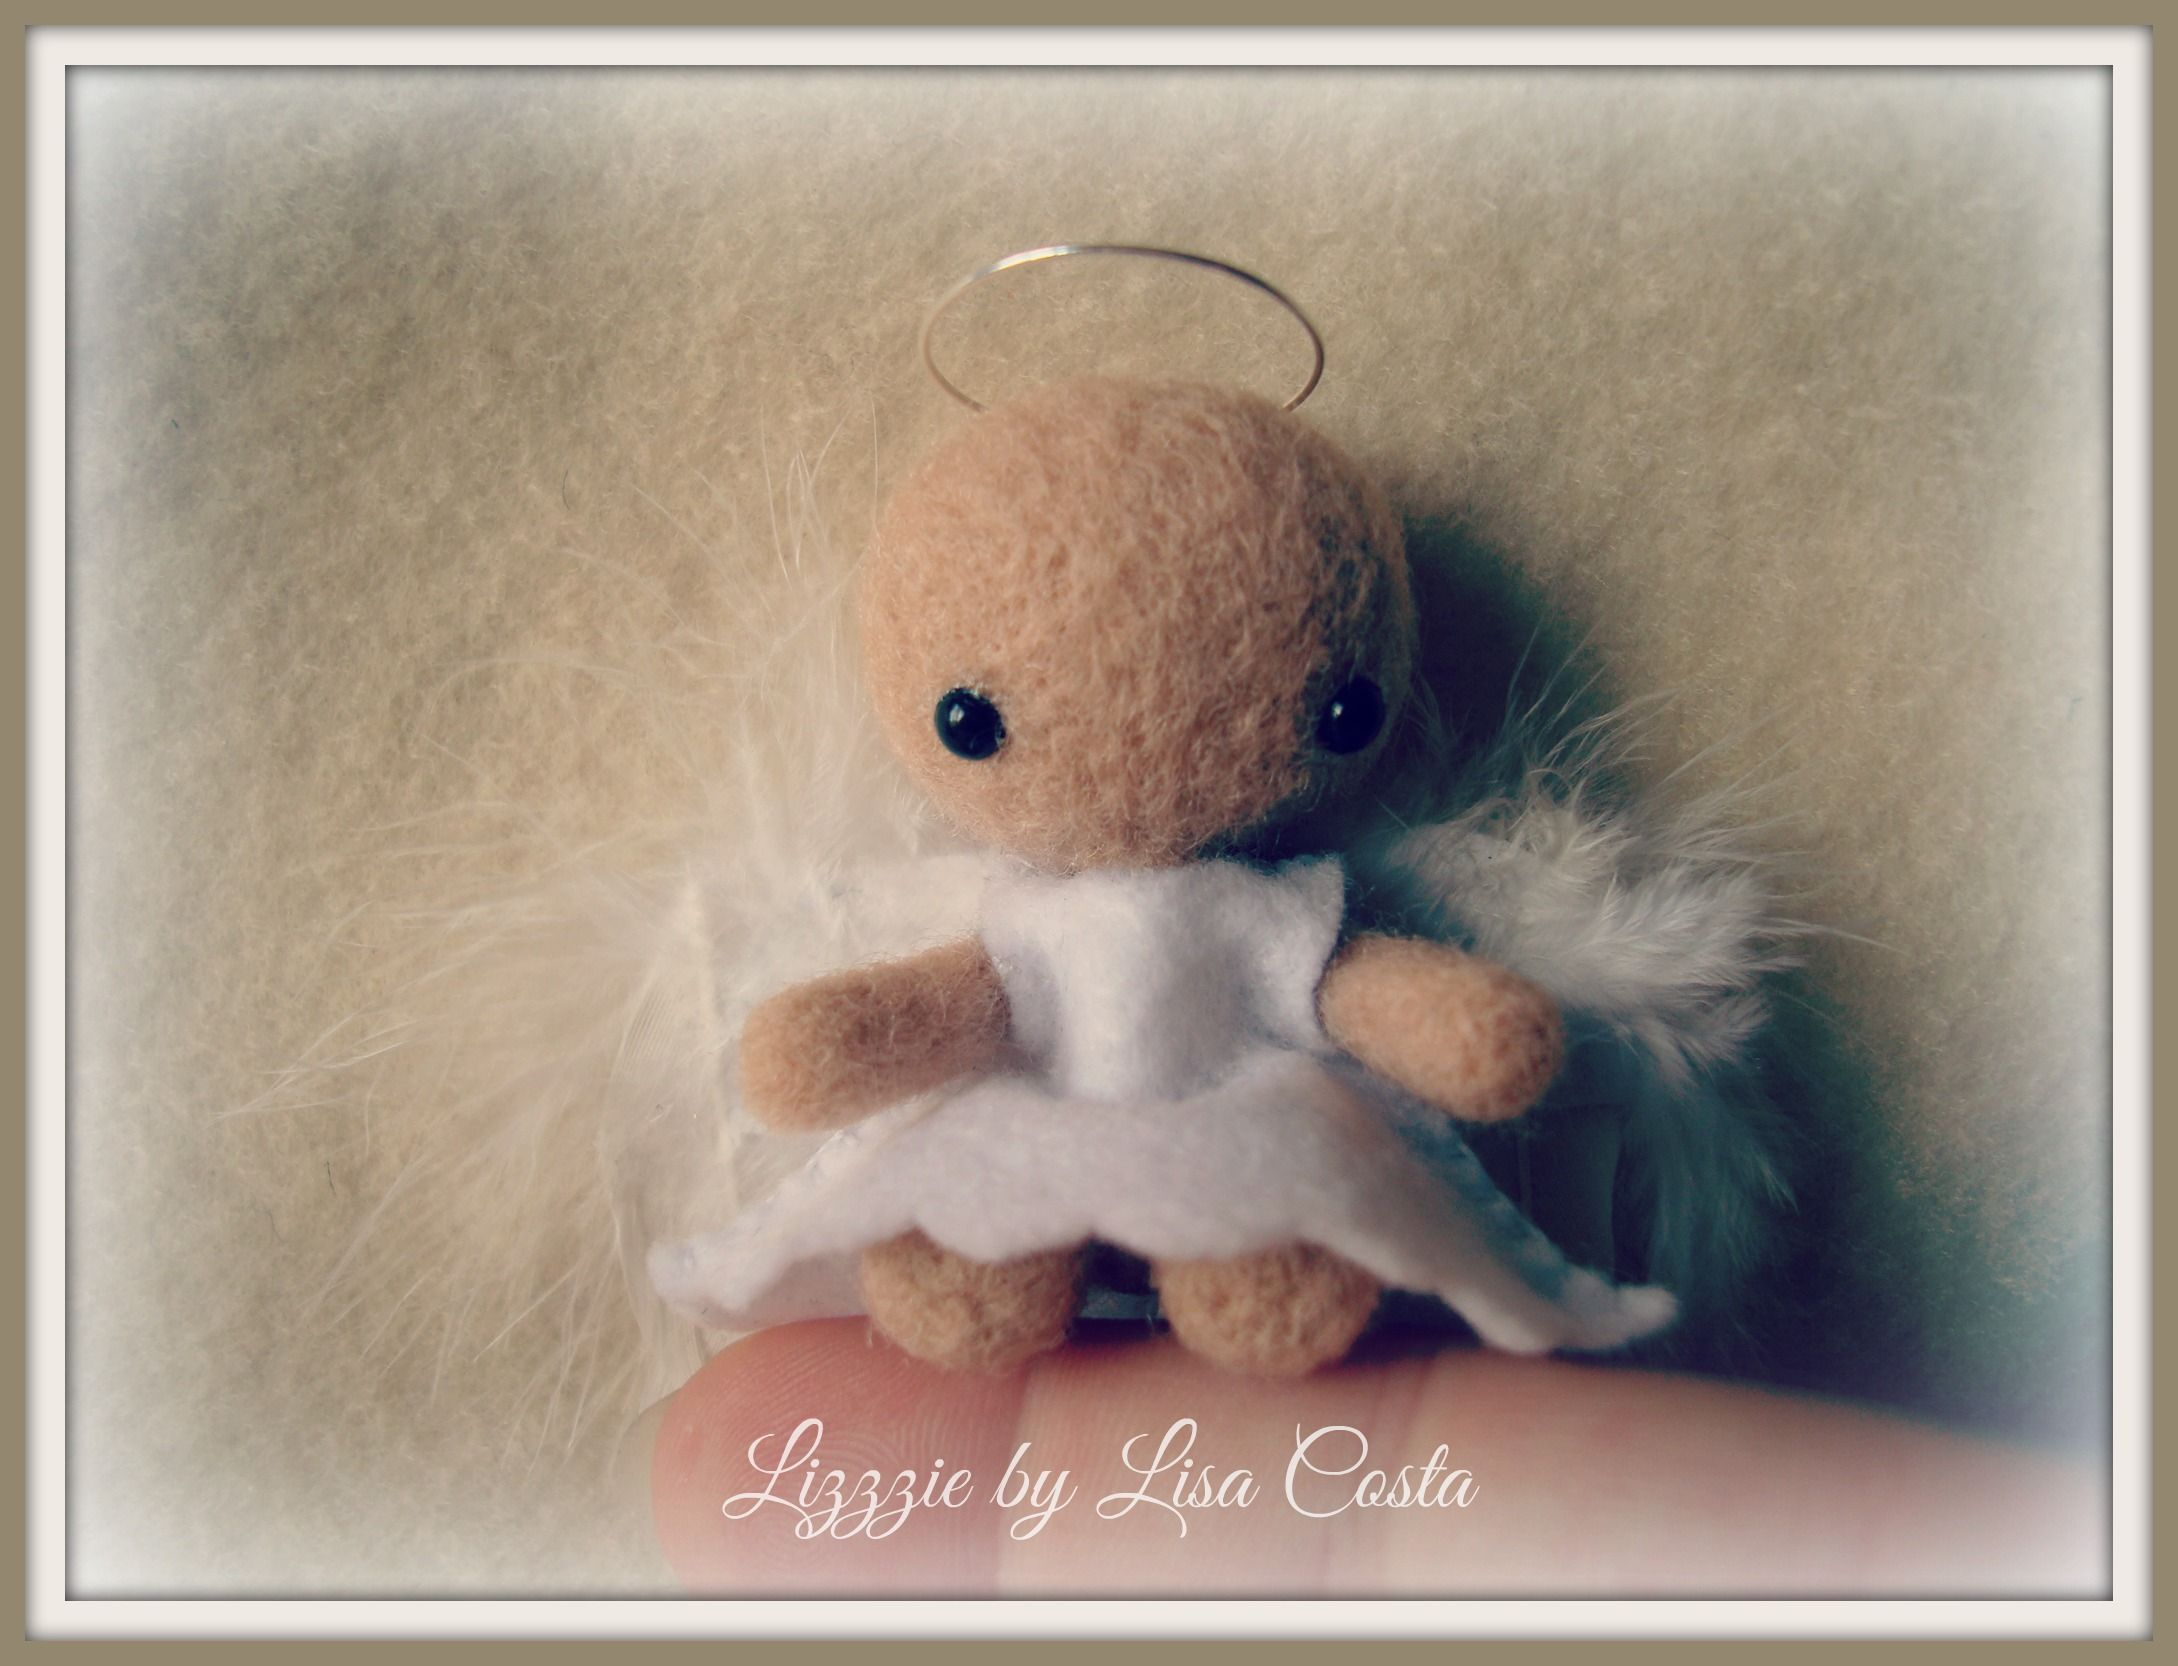 Little baby angel